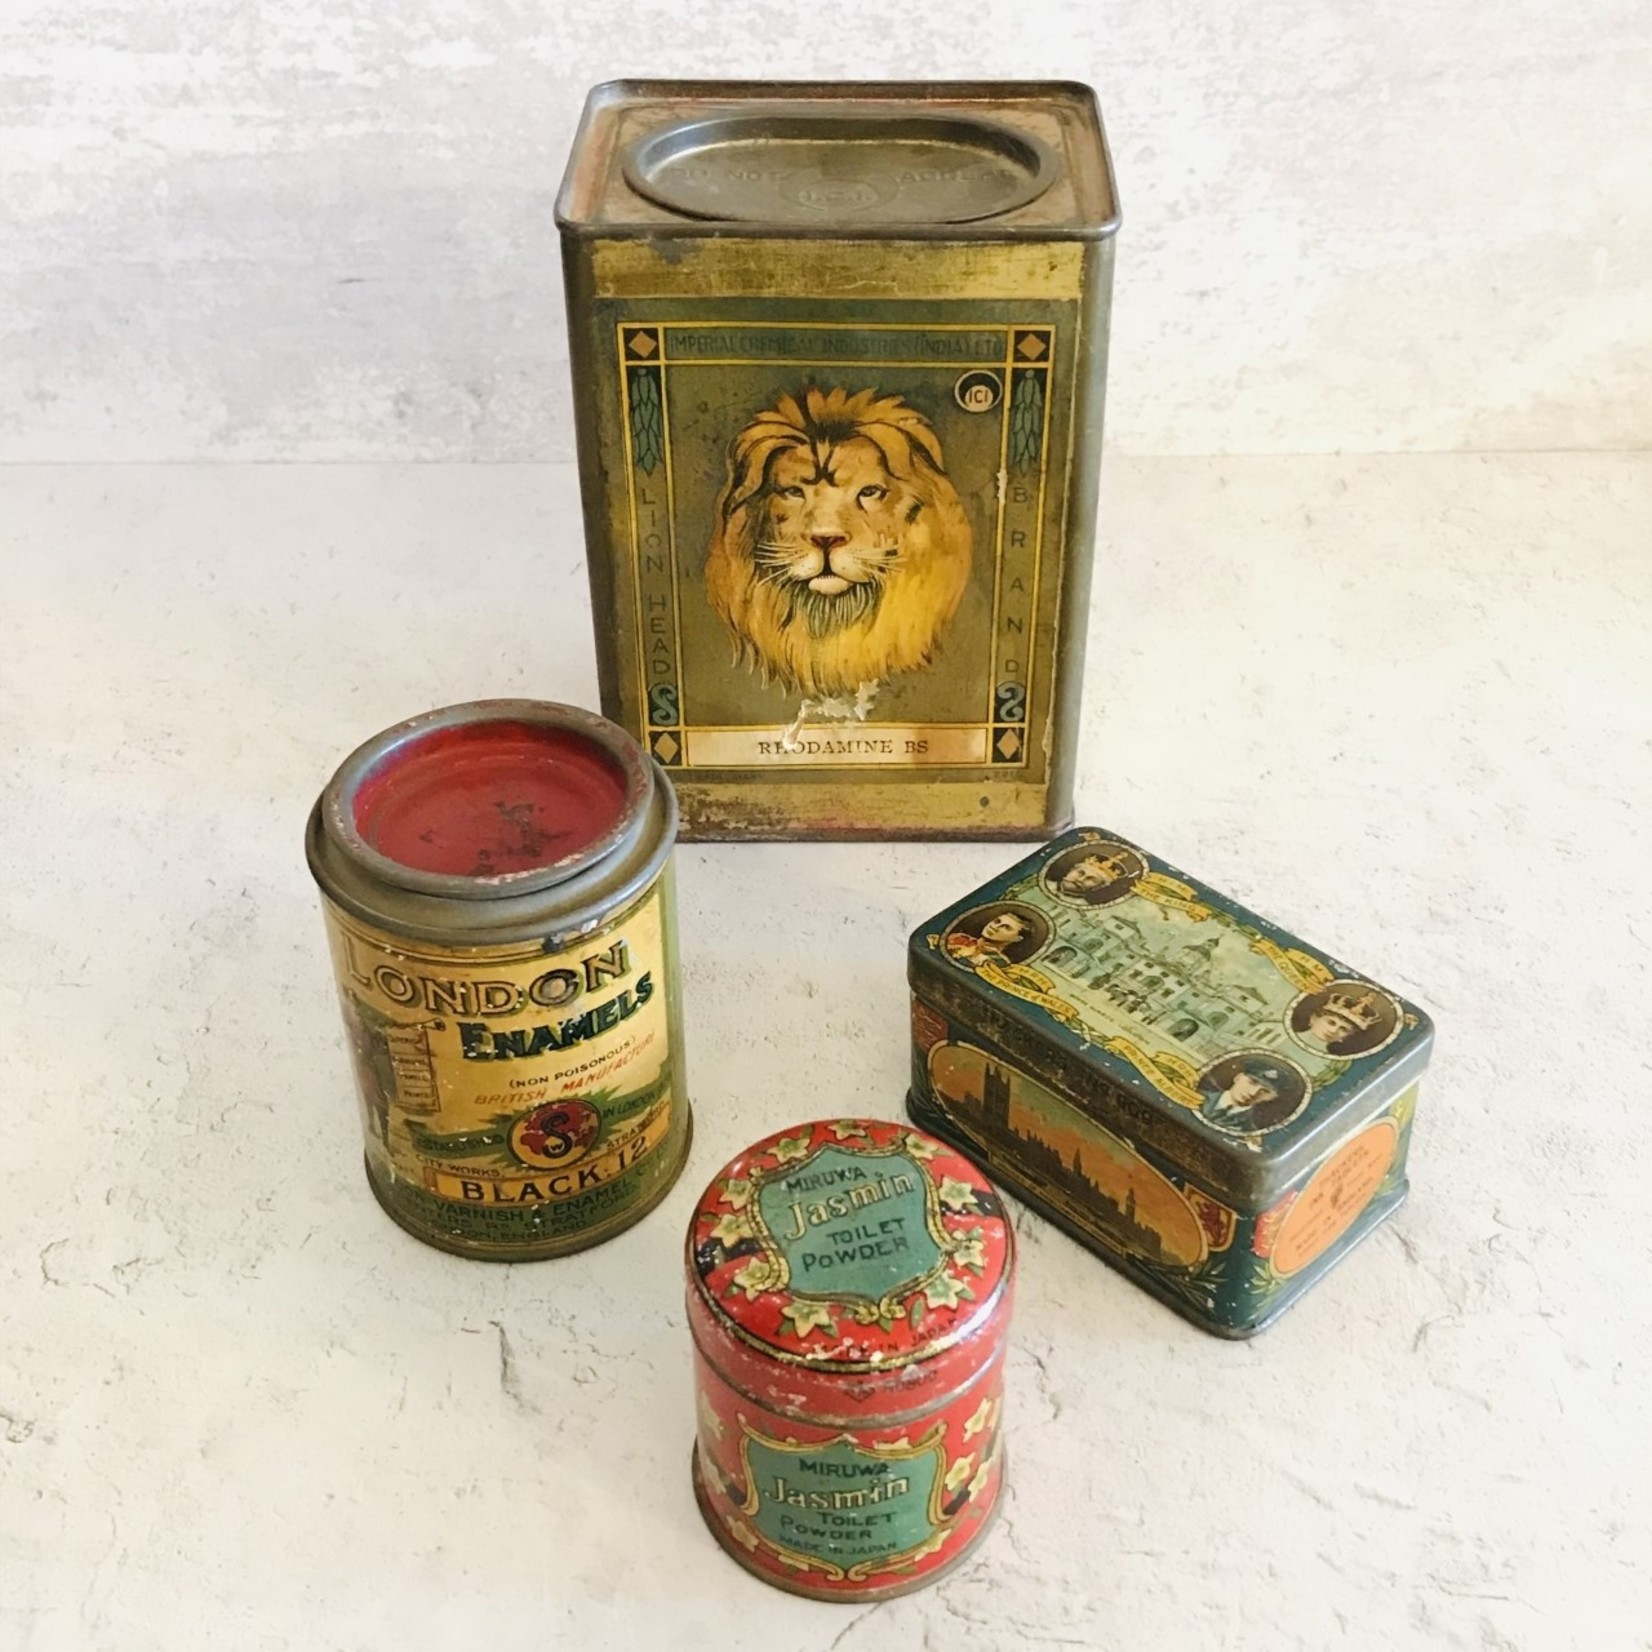 Vintage London Enamel Container